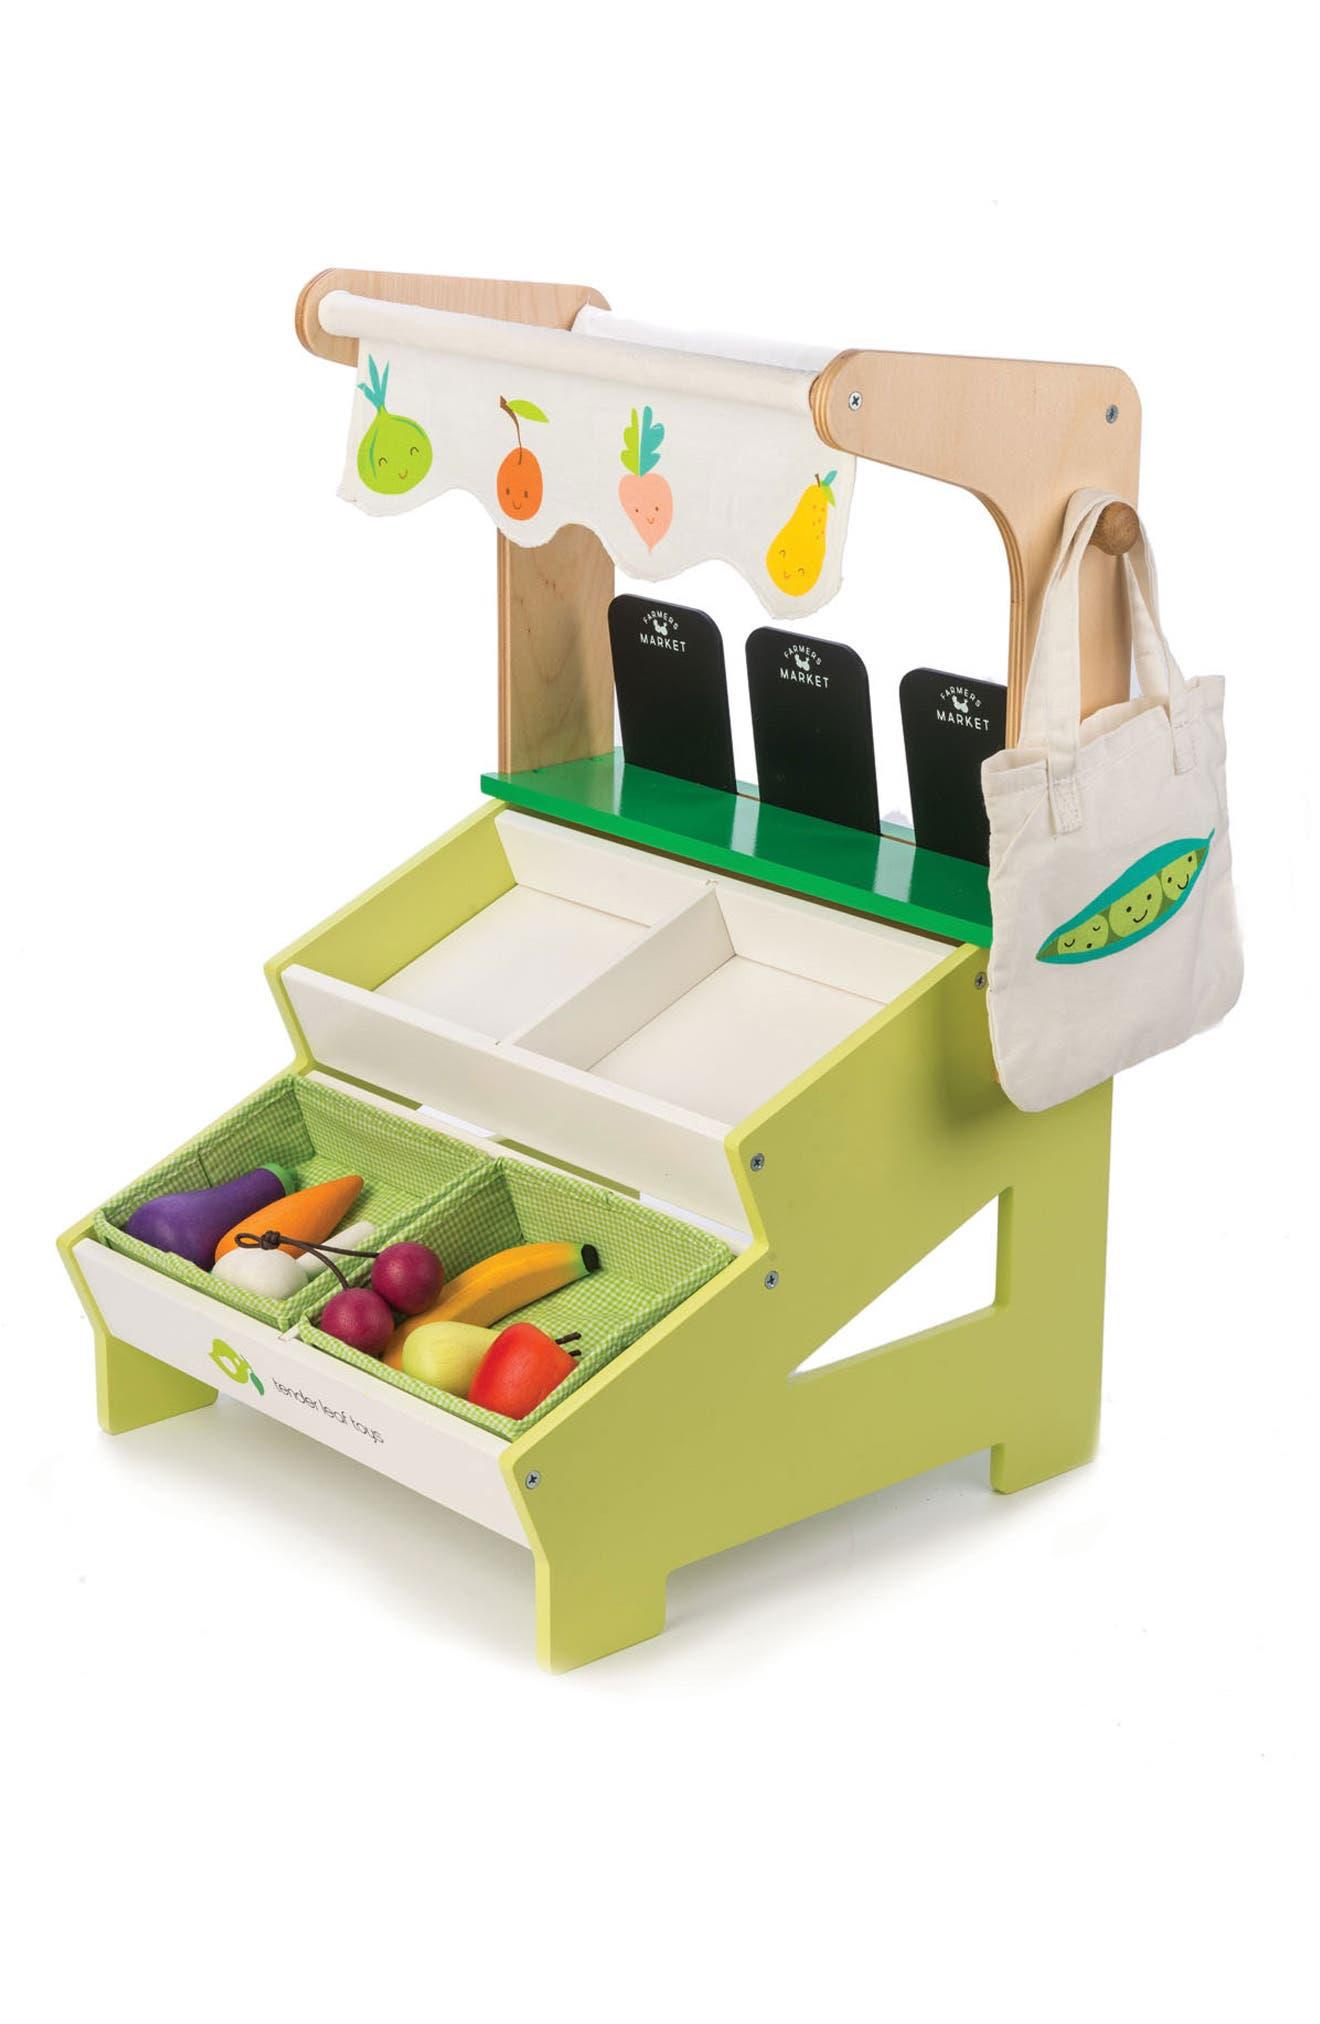 Toddler Tender Leaf Toys Farmers Market Stall Play Set